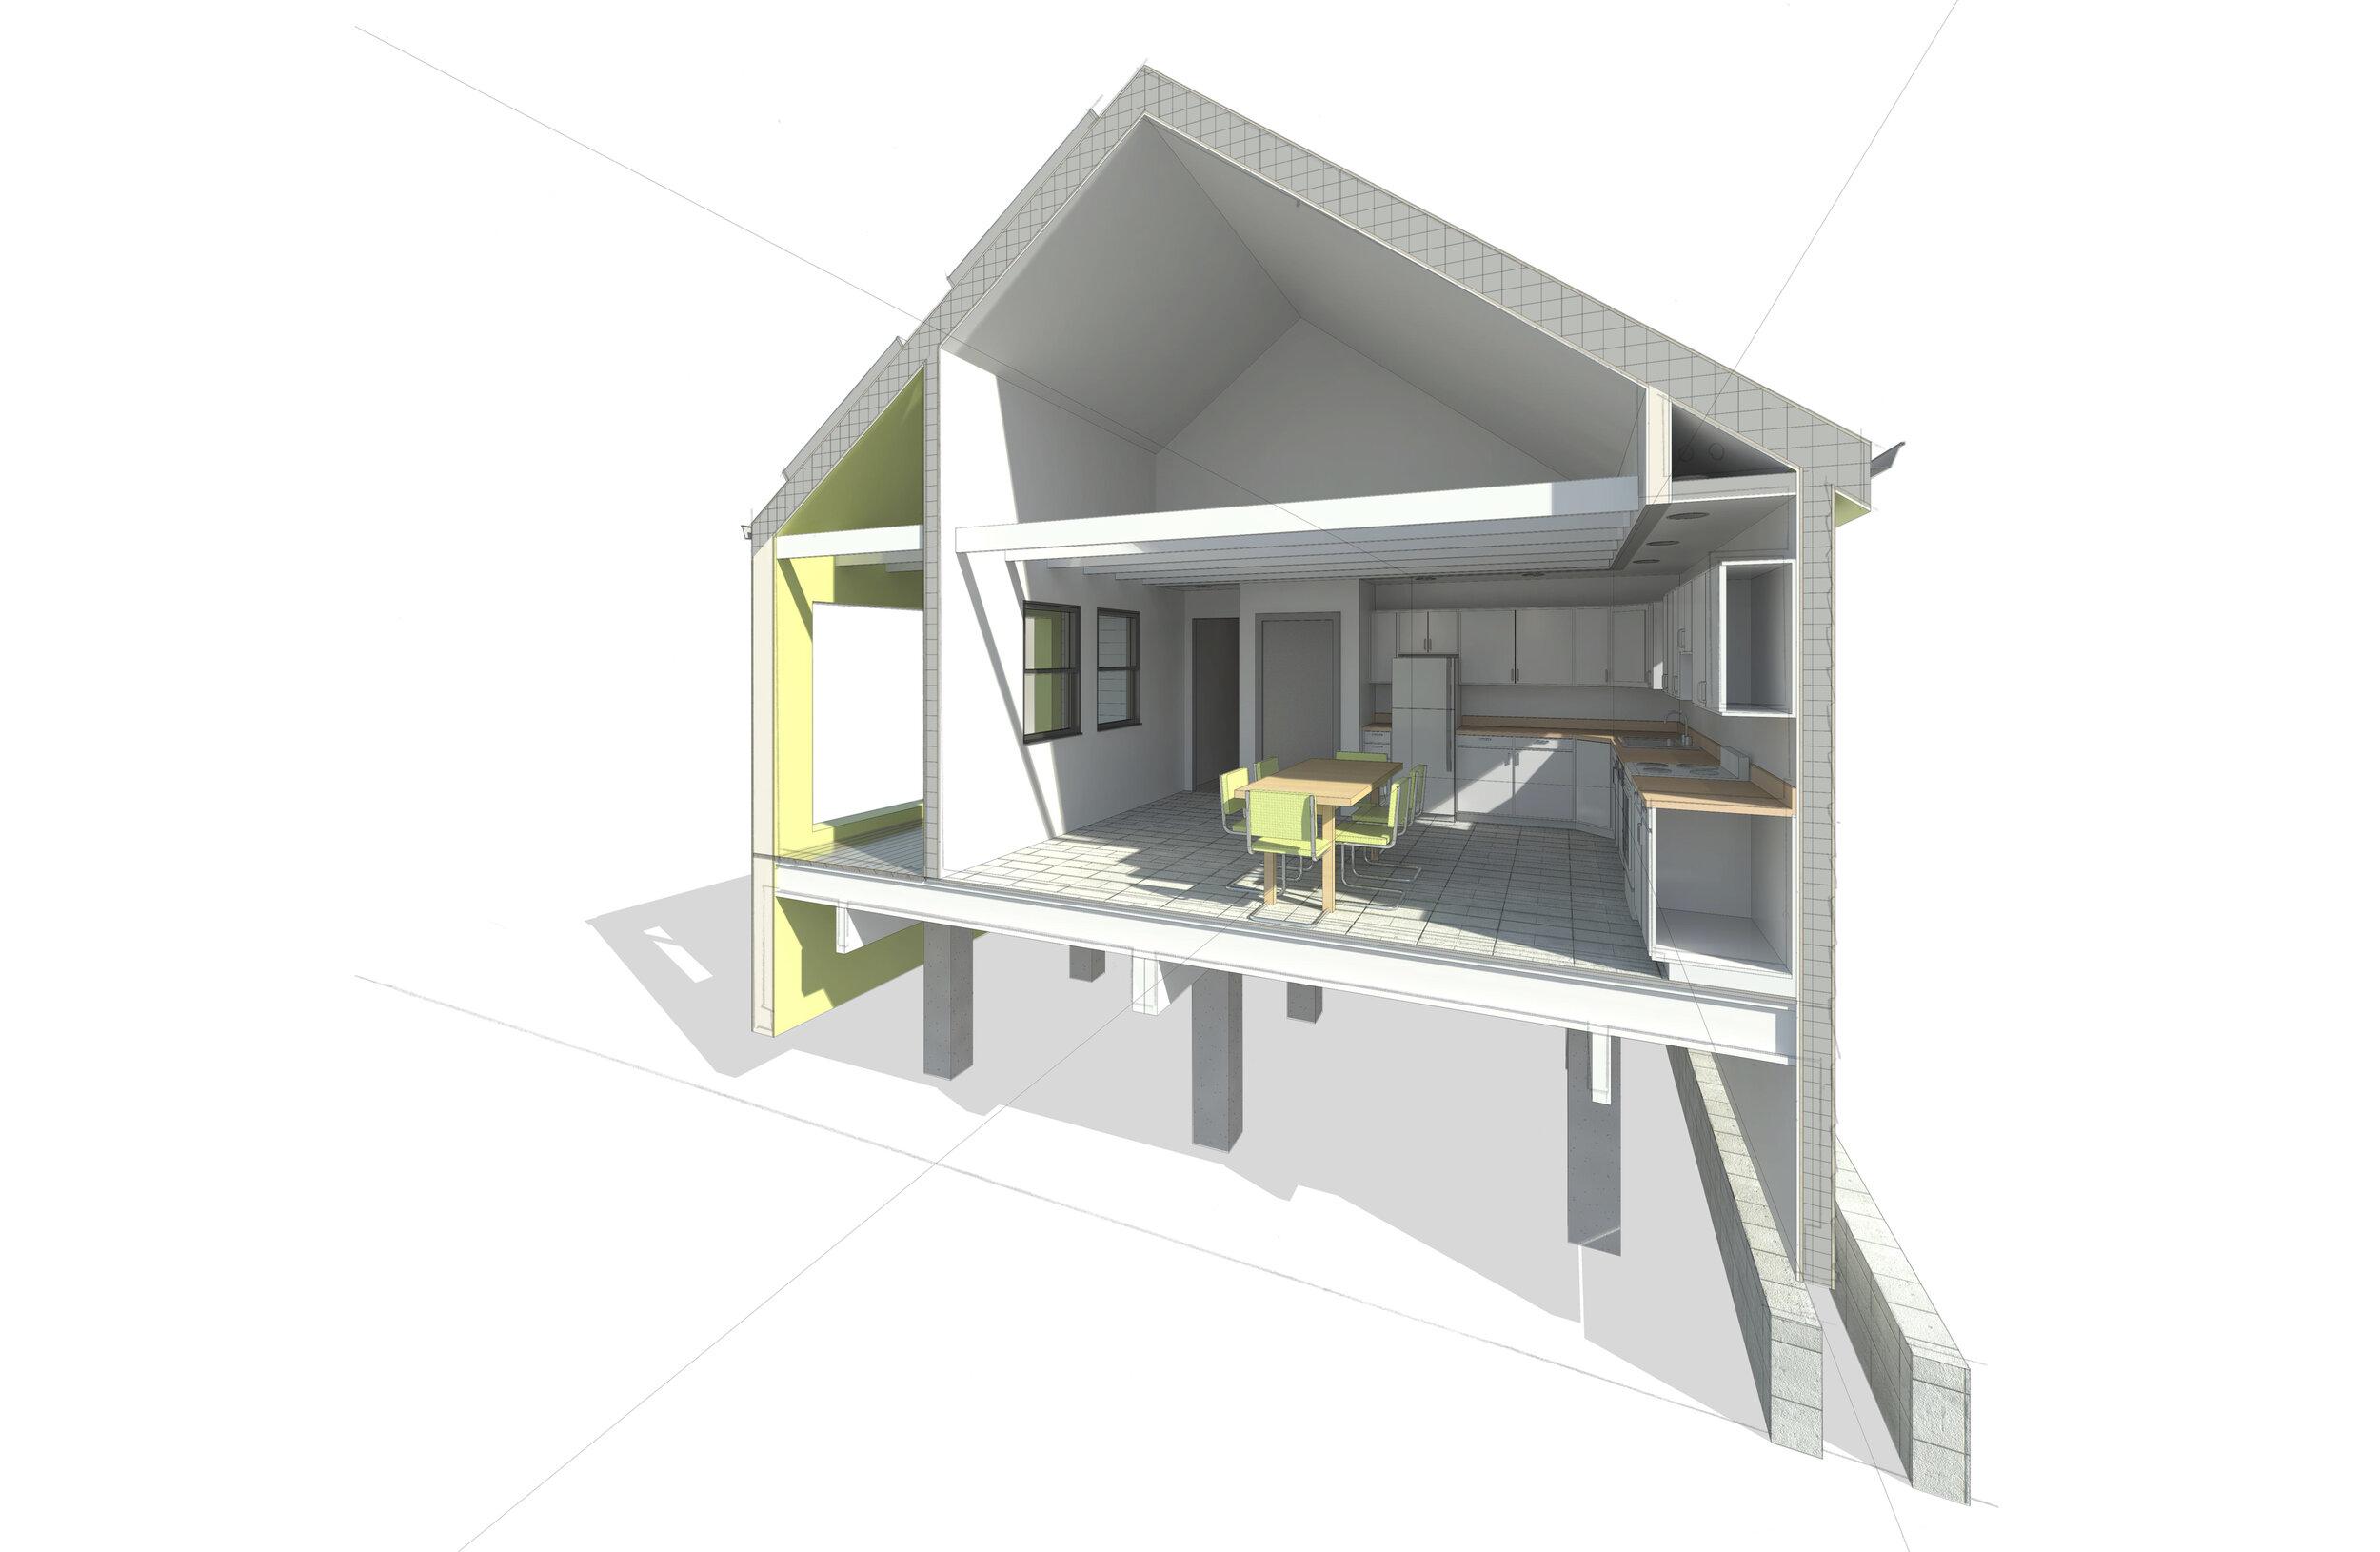 rendering3_shotgunremix_competition.jpg